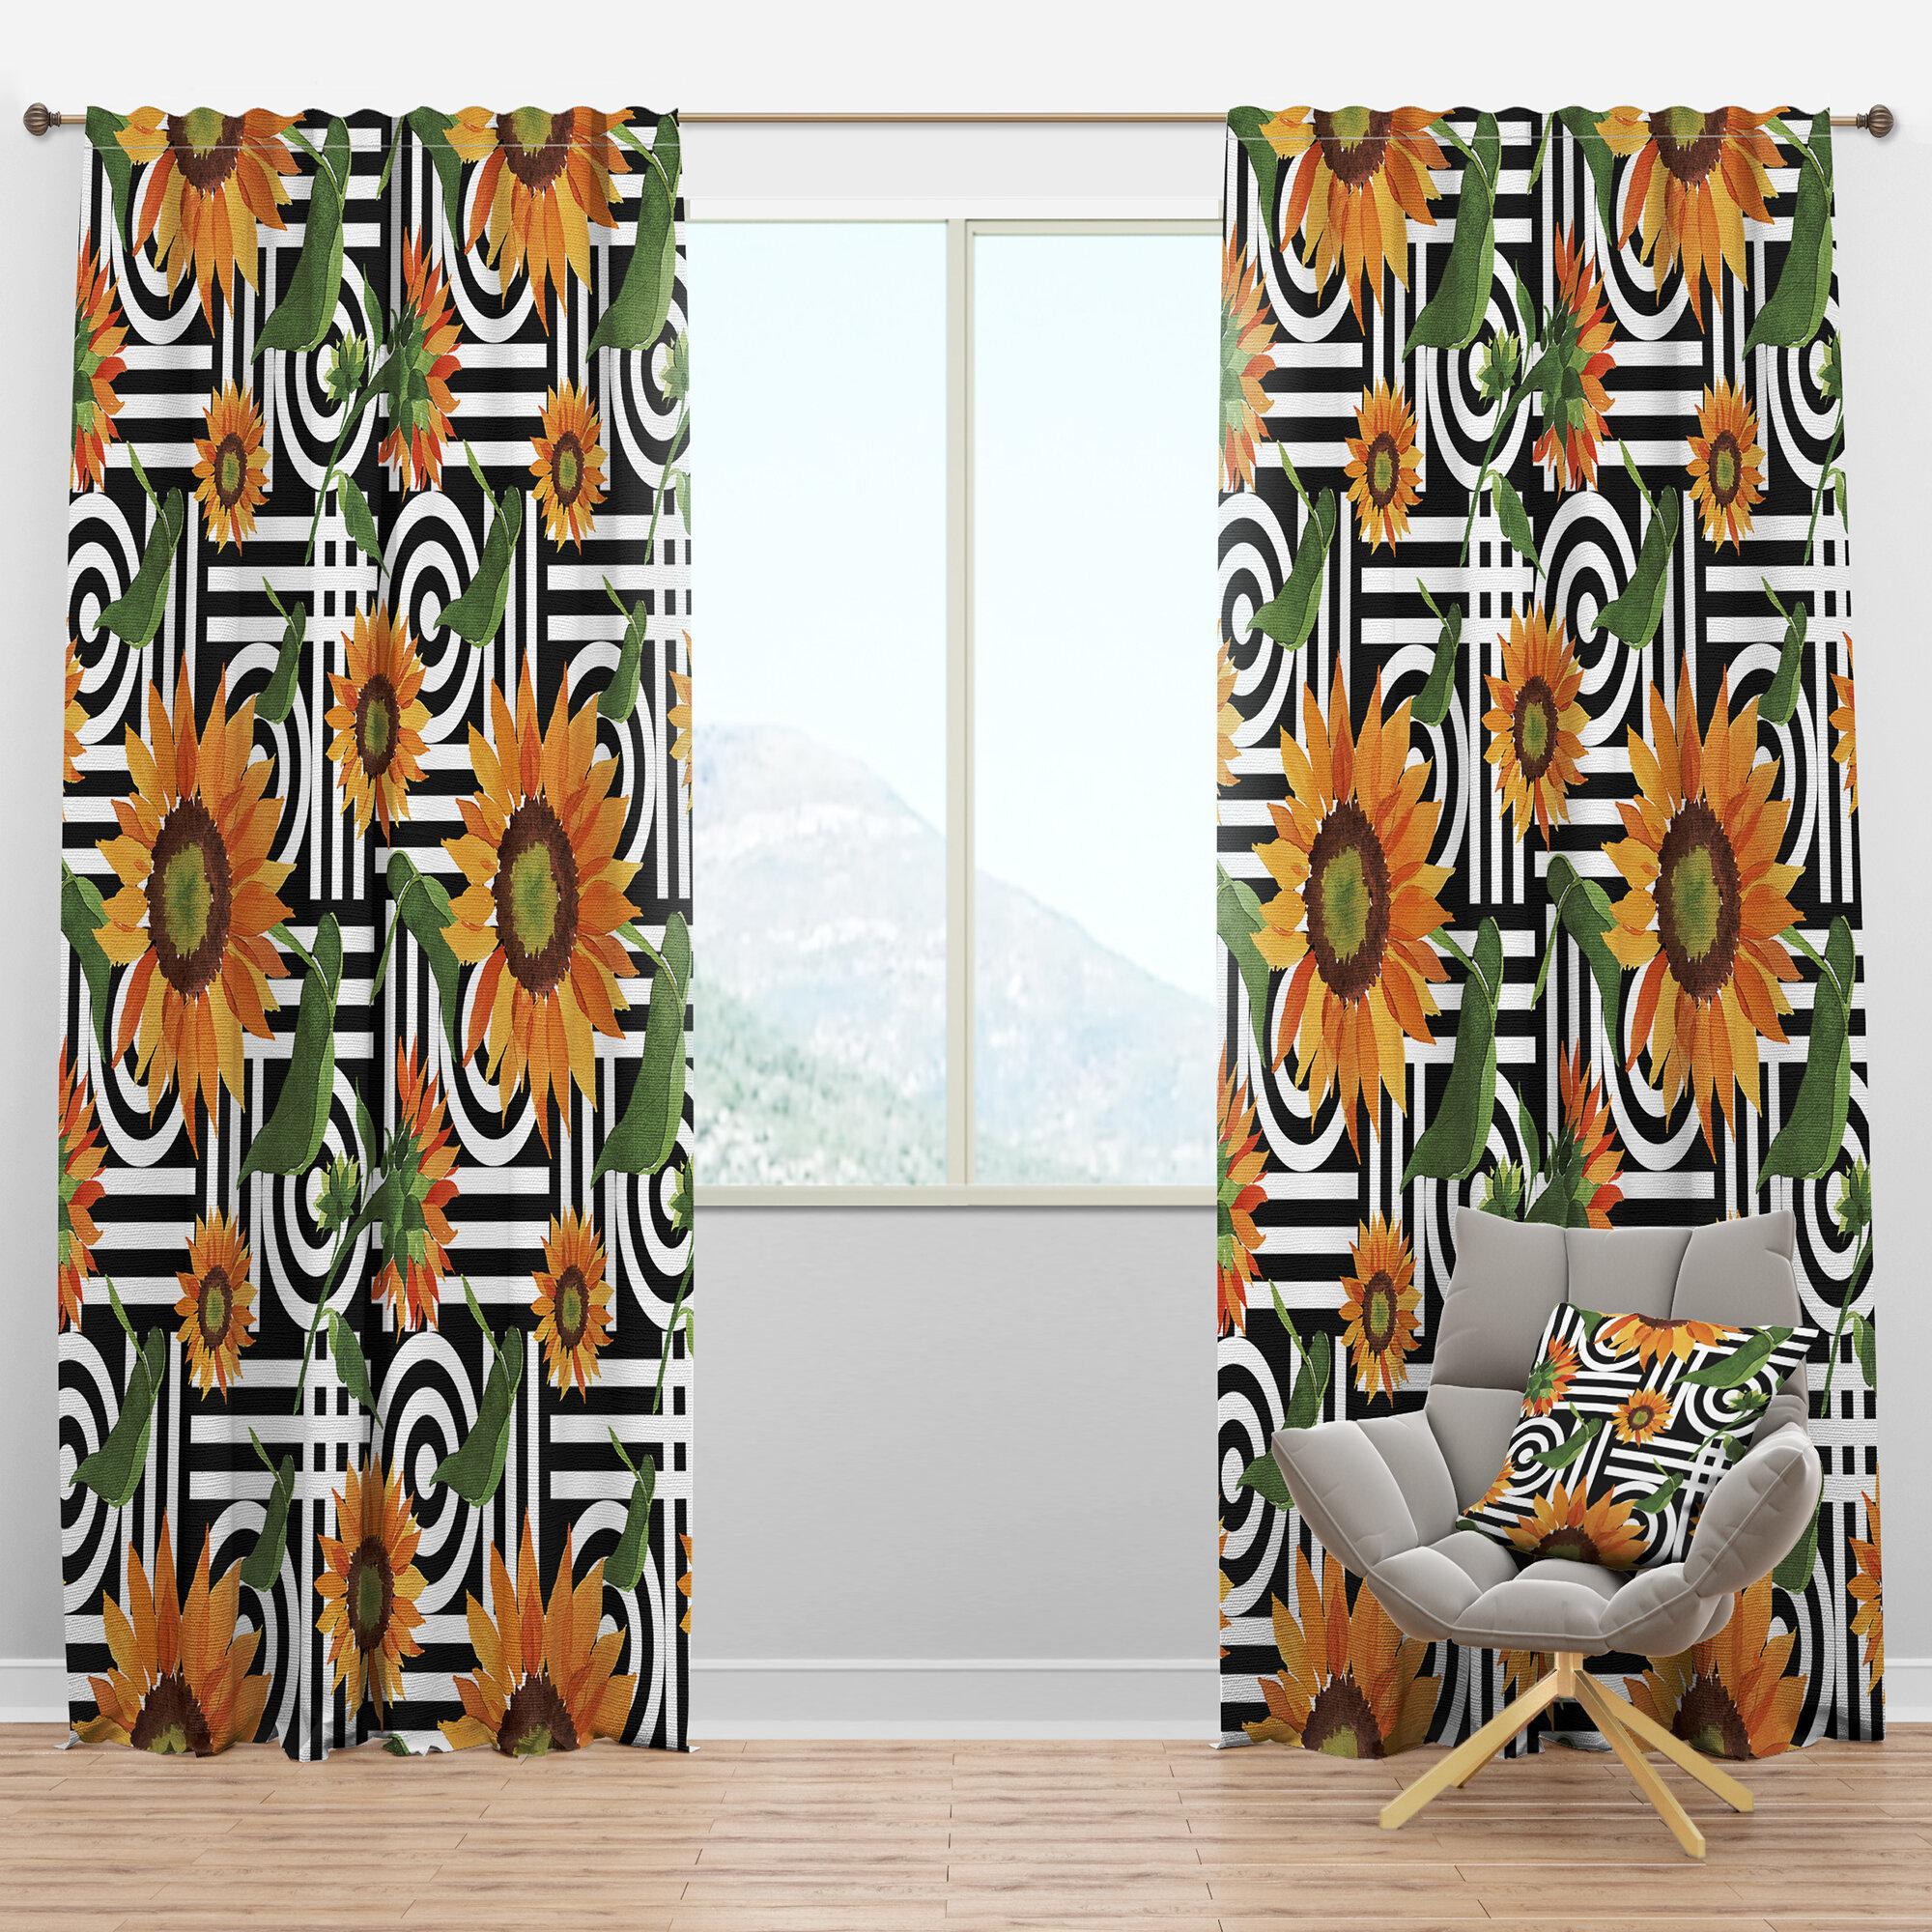 Designart Mid Century Botanical Ii Floral Semi Sheer Thermal Rod Pocket Single Curtain Panel Wayfair